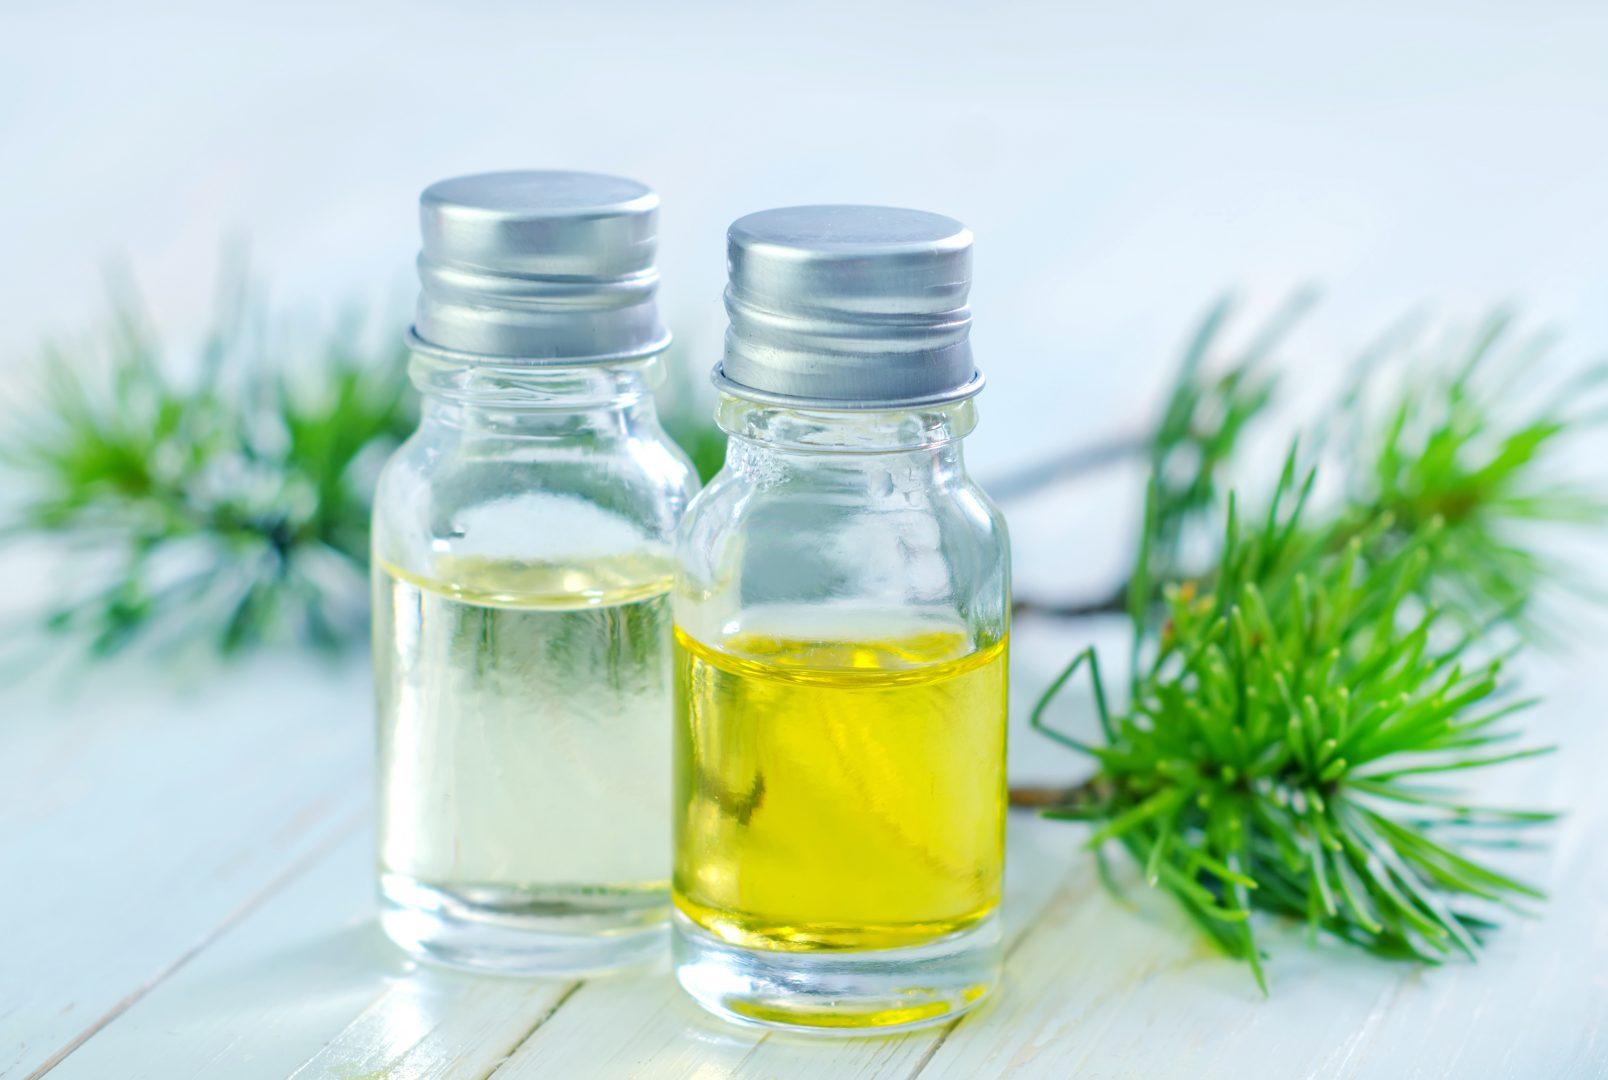 Натуральные ароматизаторы